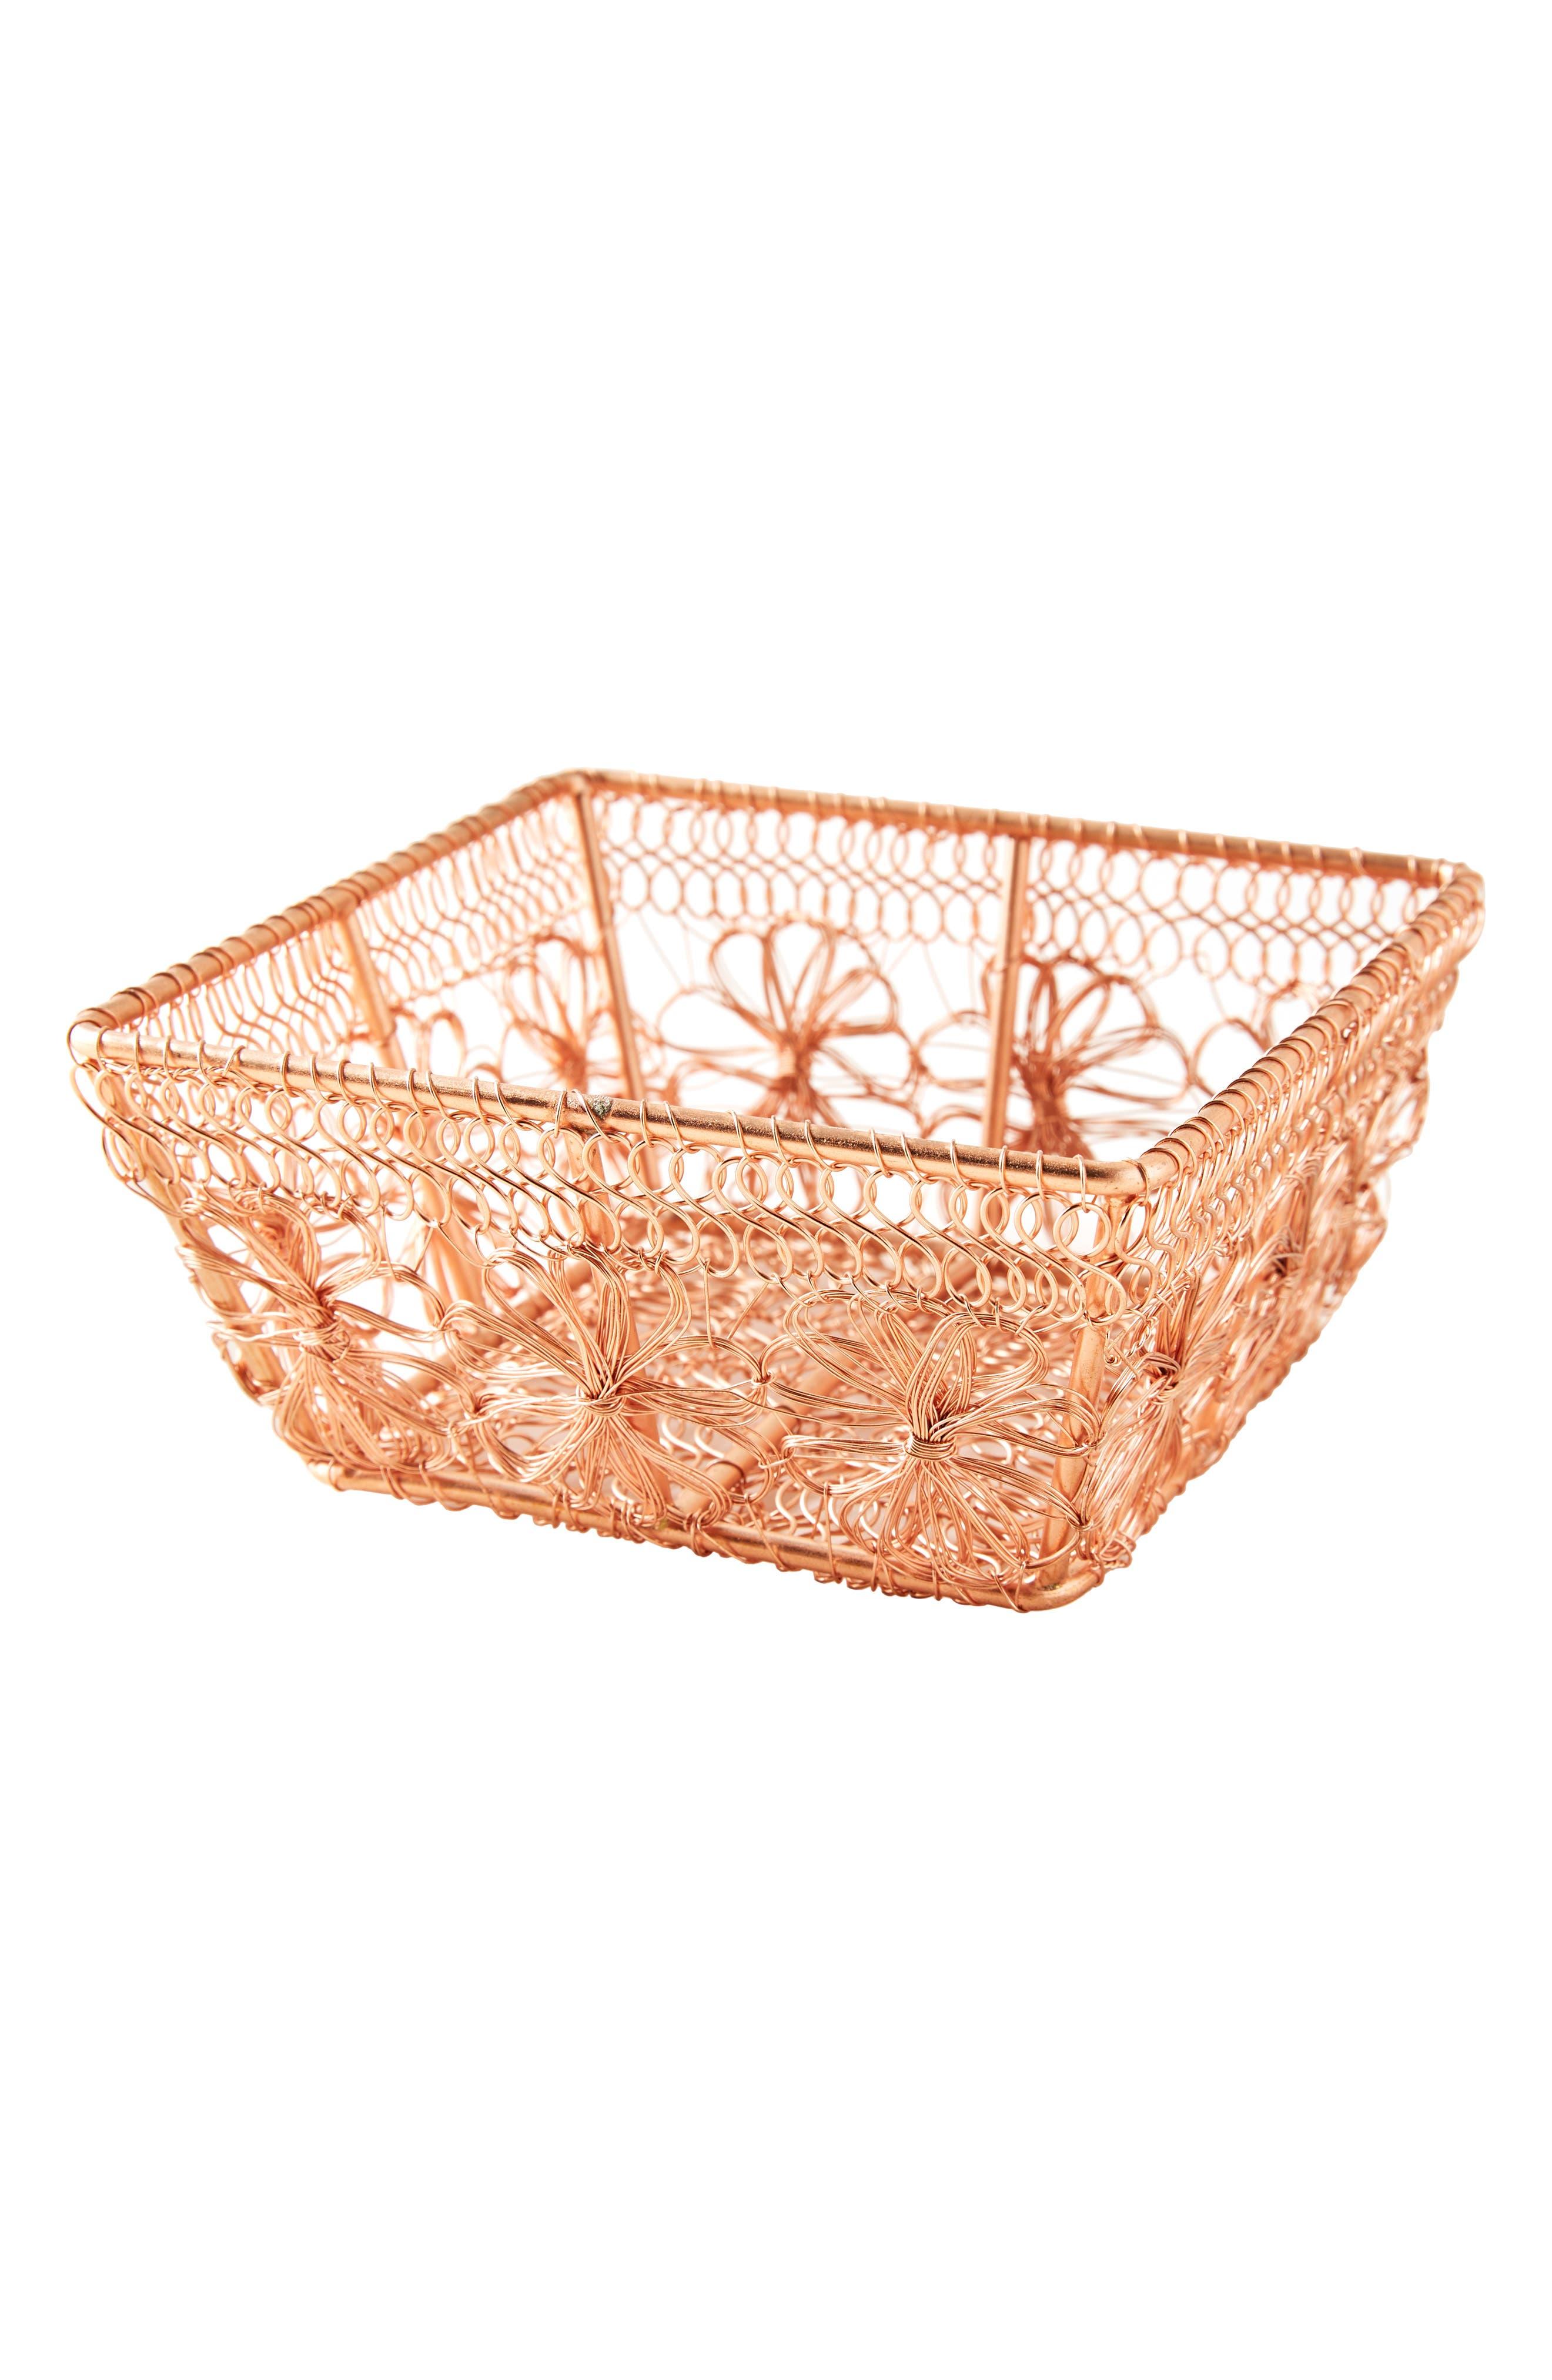 ANTHROPOLOGIE, Copper Floral Berry Basket, Alternate thumbnail 4, color, COPPER